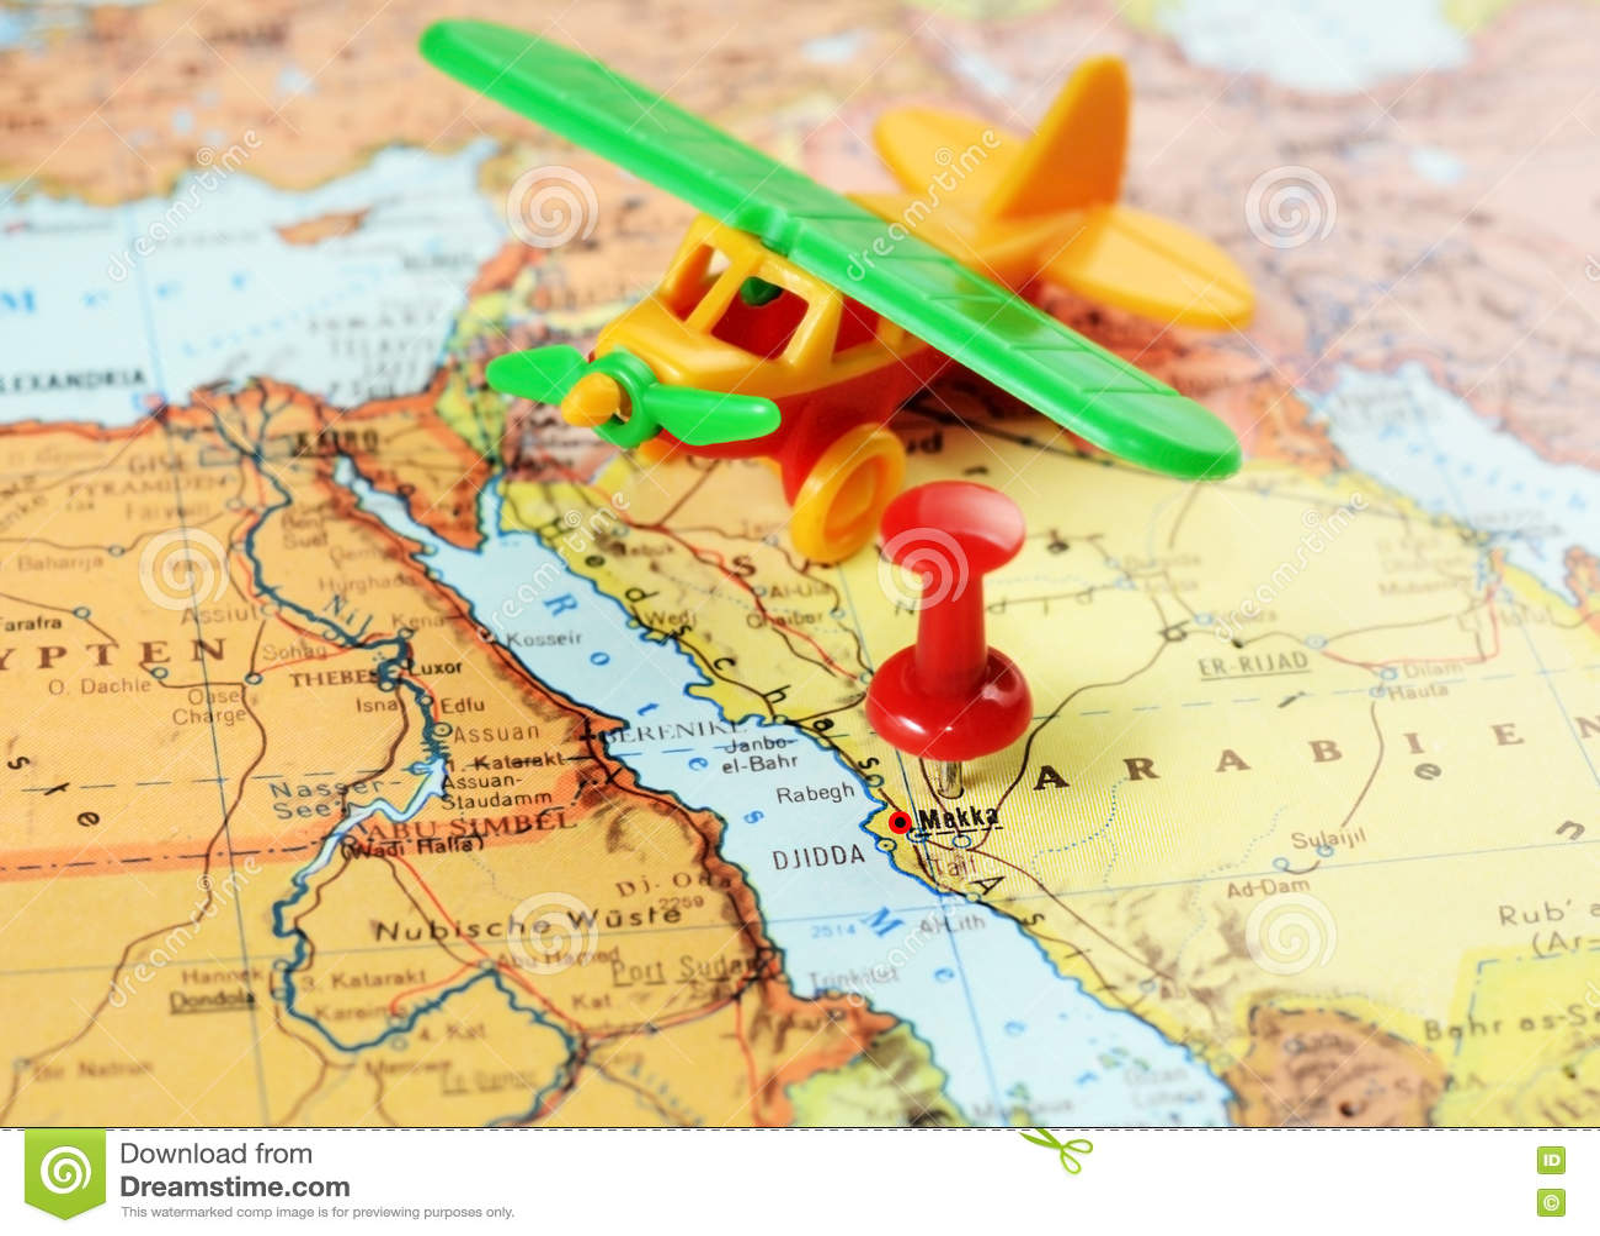 Mecca,Saudi Arabia Airplane Map Stock Photo - Image of islamic ...